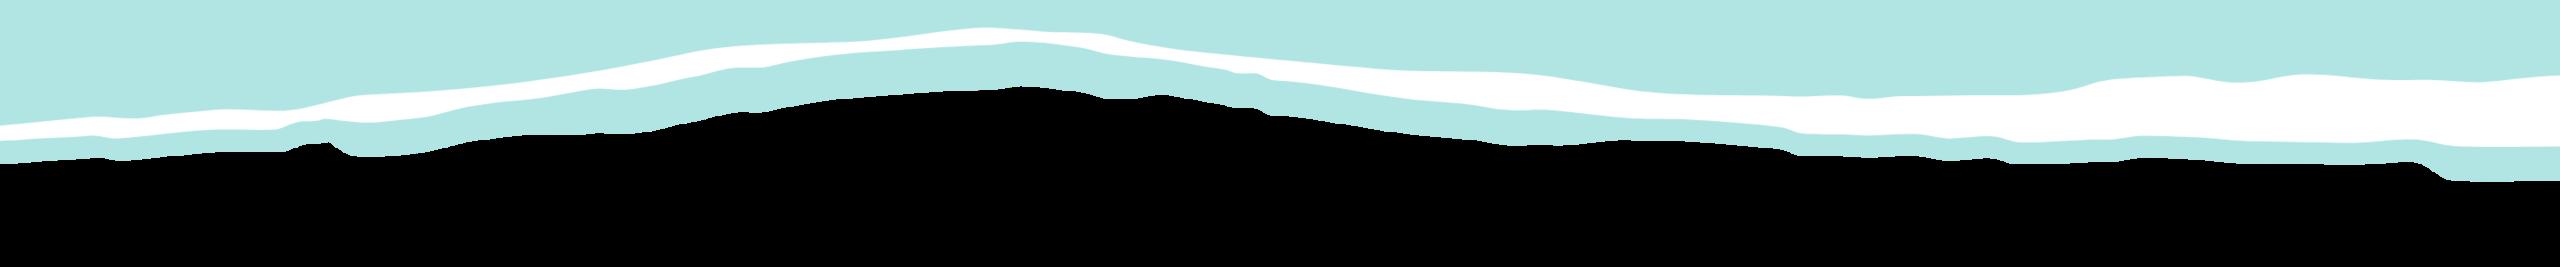 blue wave image